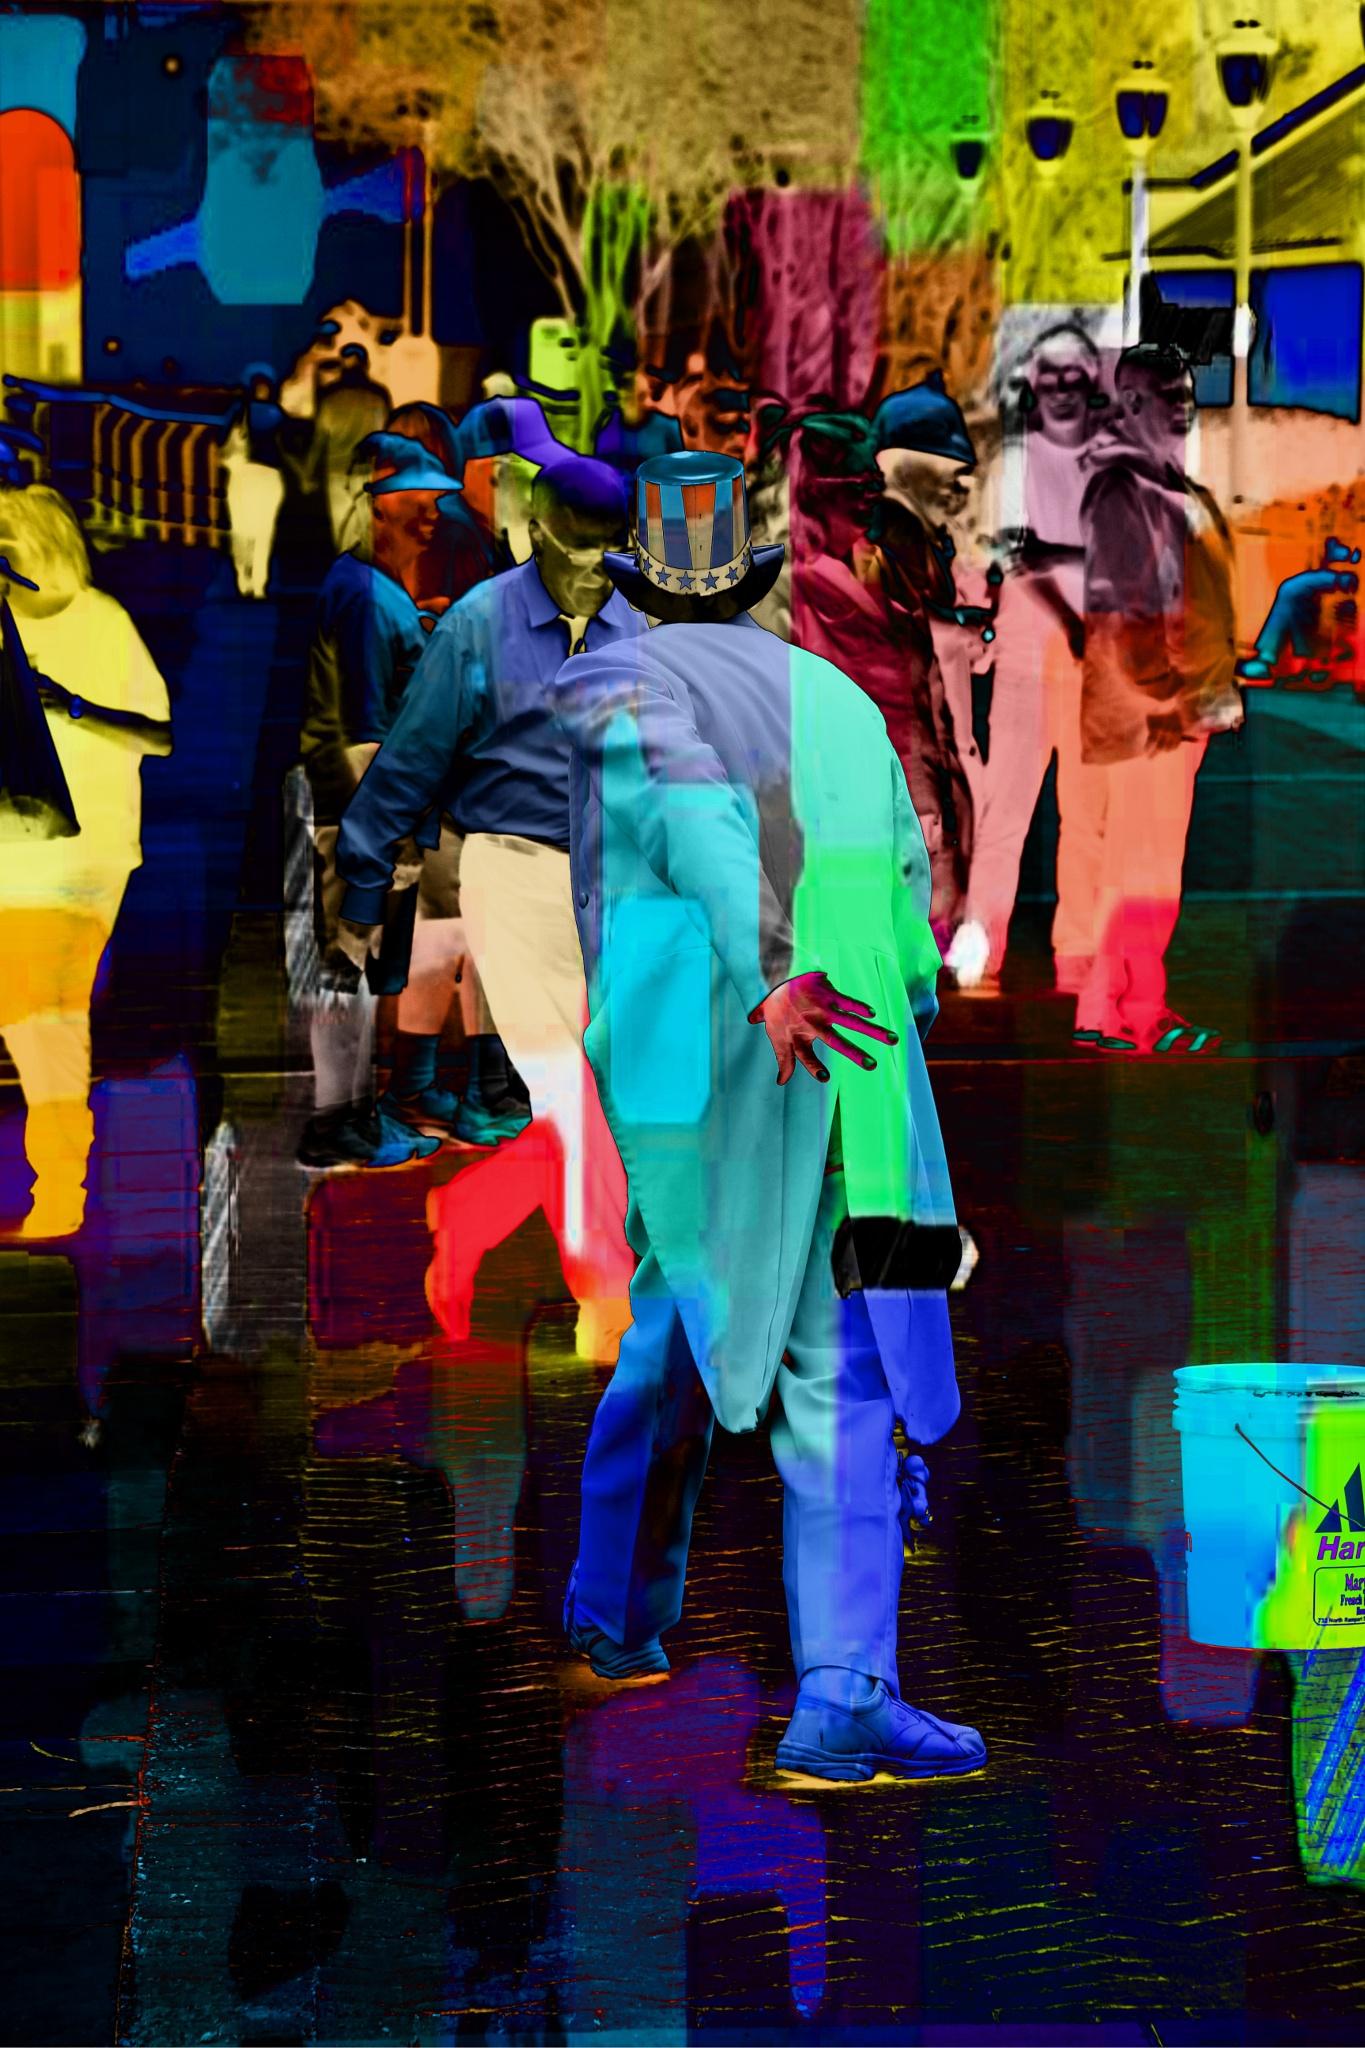 Street Performer by Tyzin